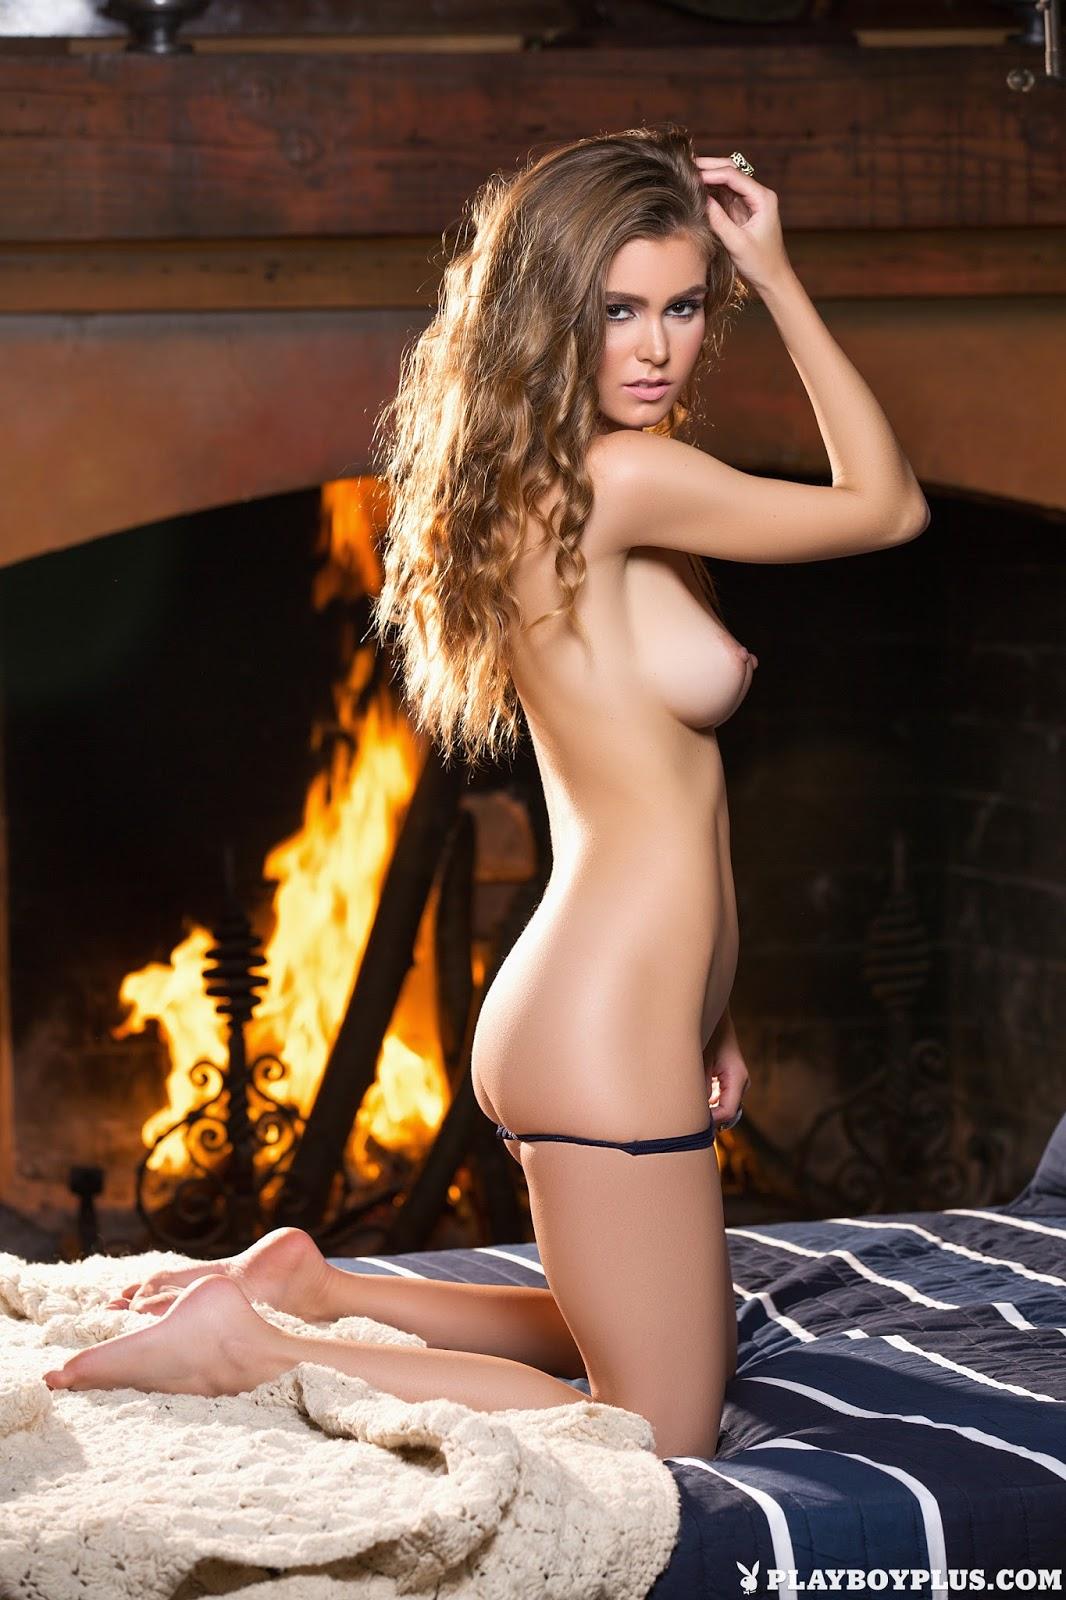 Playboy Plus Strip